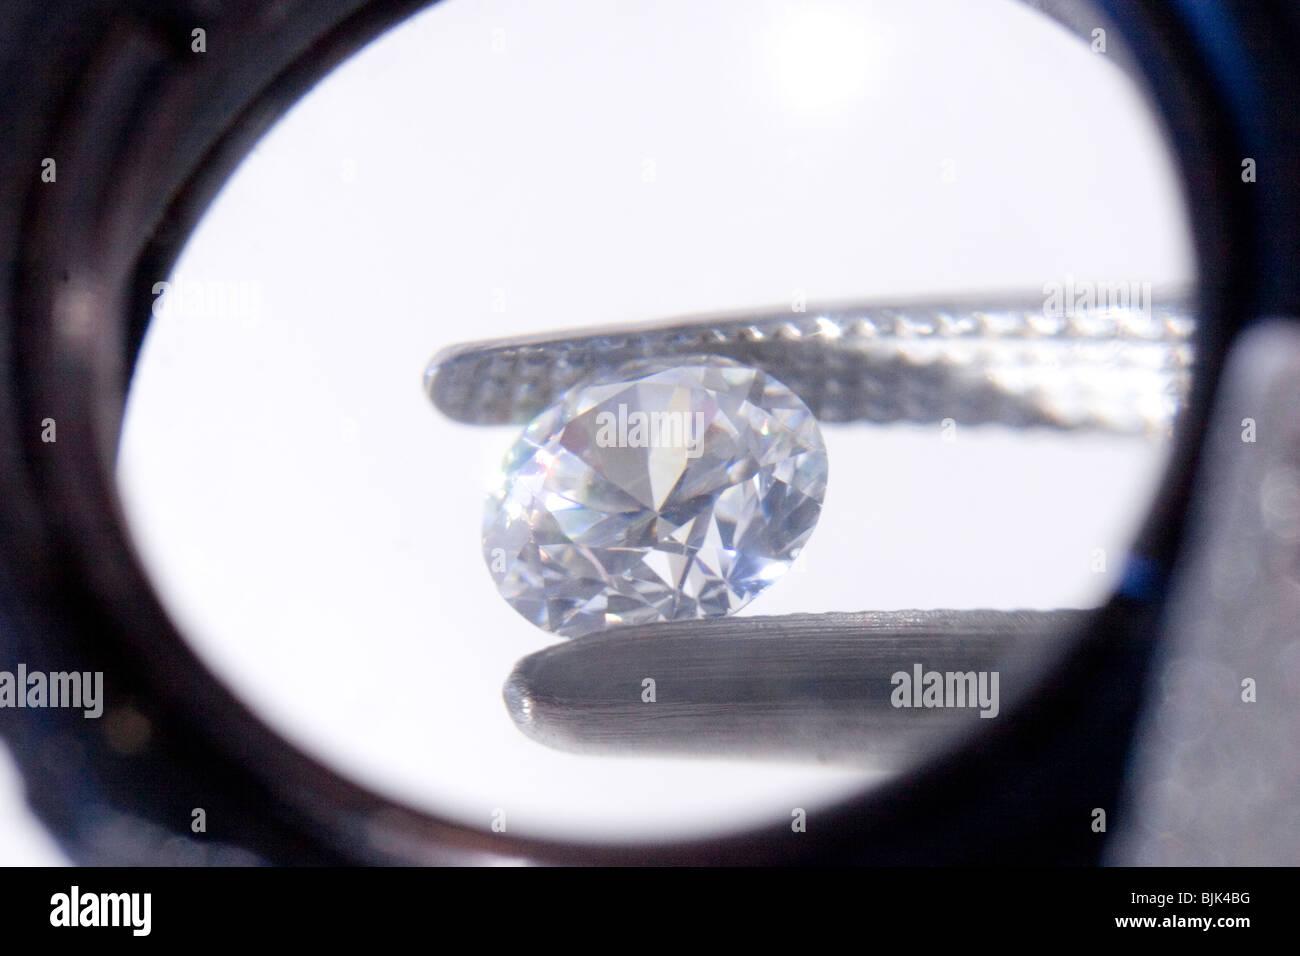 Gemstone Through a Loupe Stock Photo